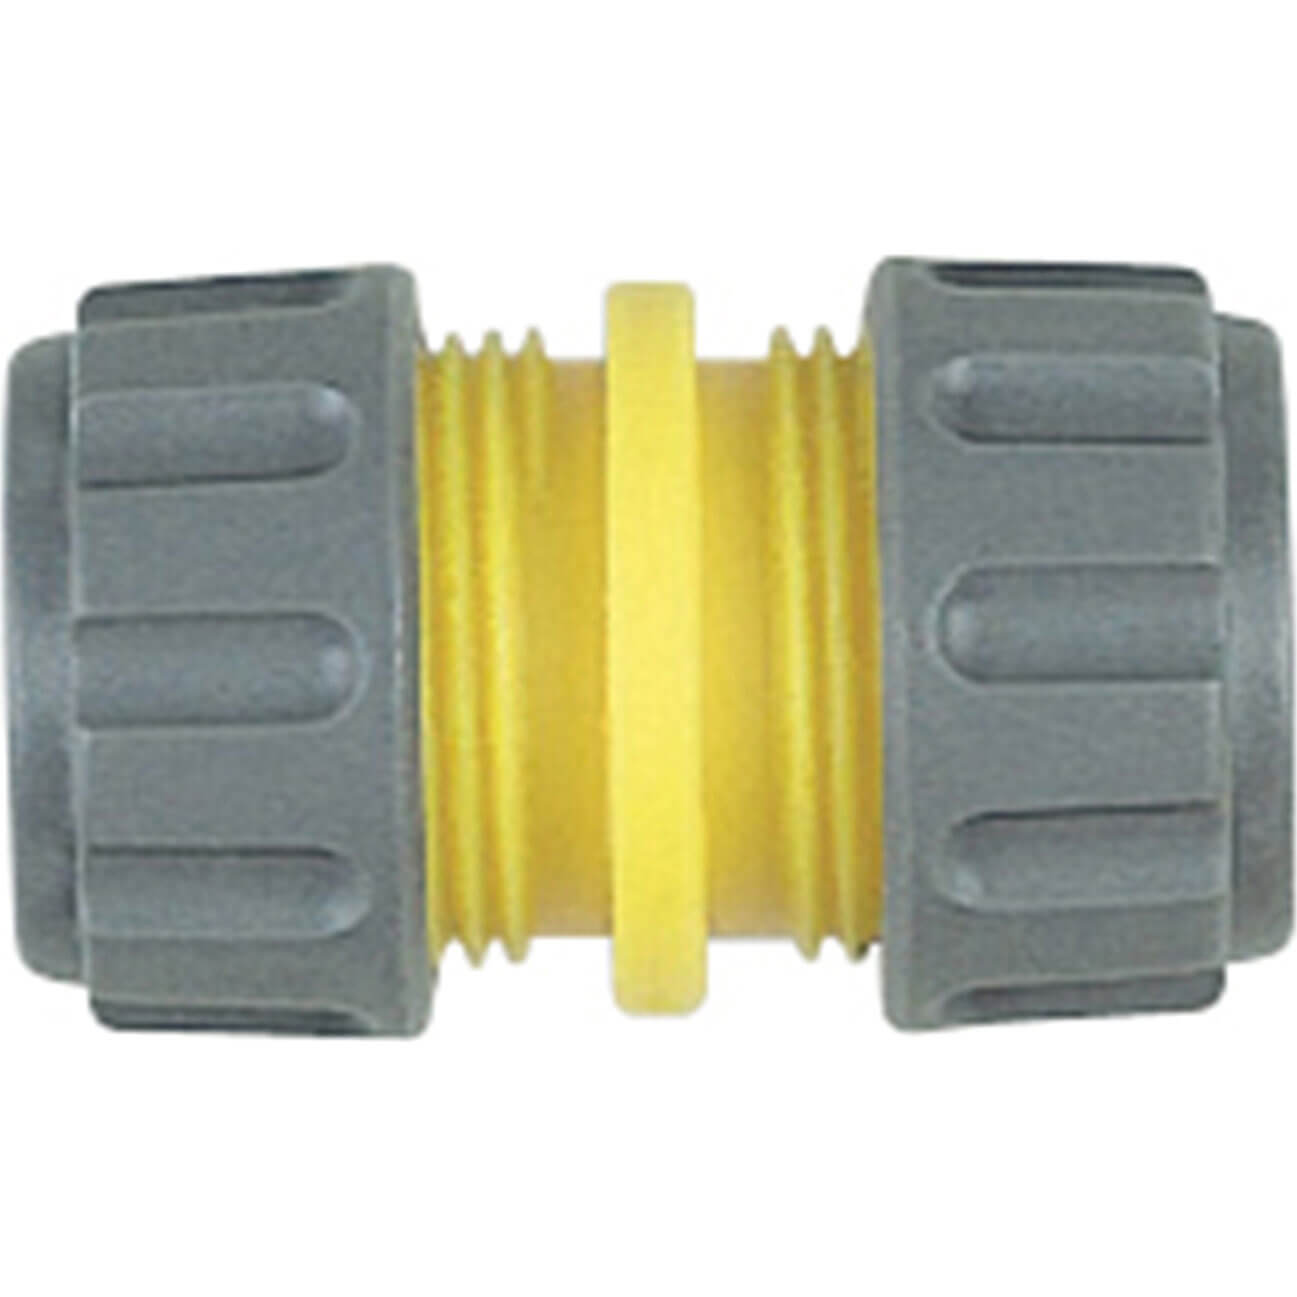 Hozelock Joiner & Repair Hose Pipe Connector 1  25mm Pack of 1